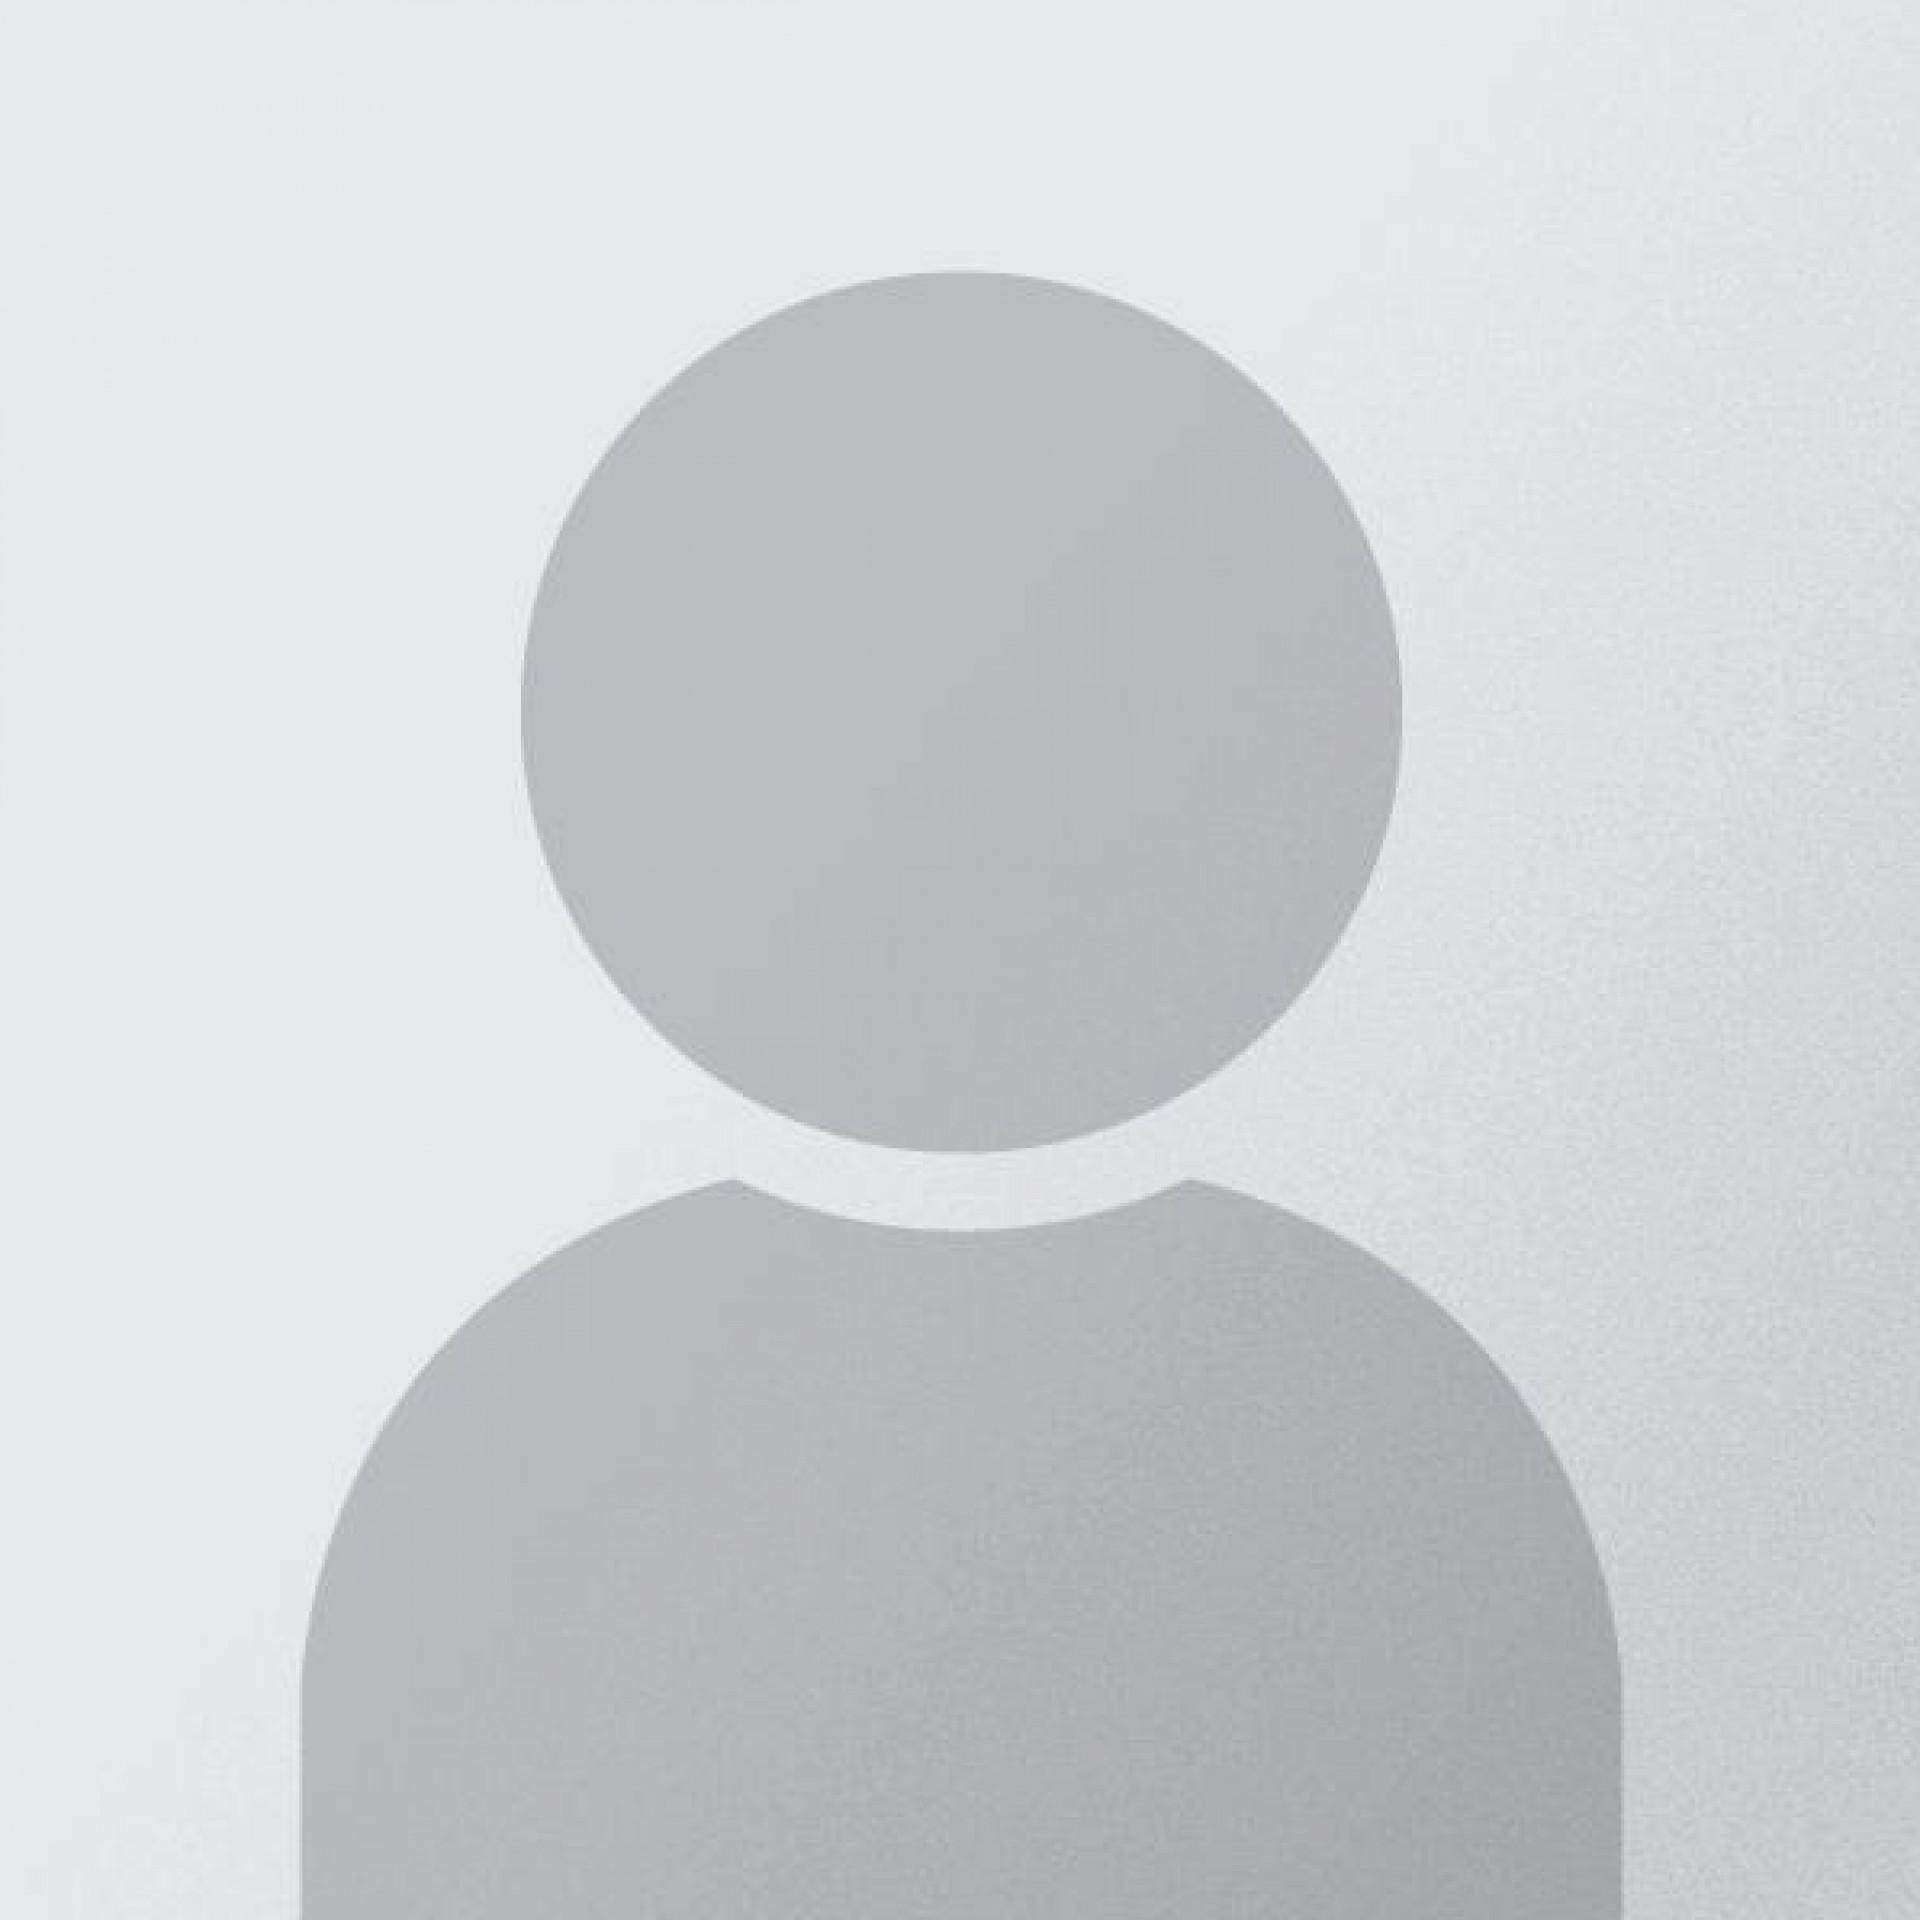 fotografia p021 profilu 0101STO5RL